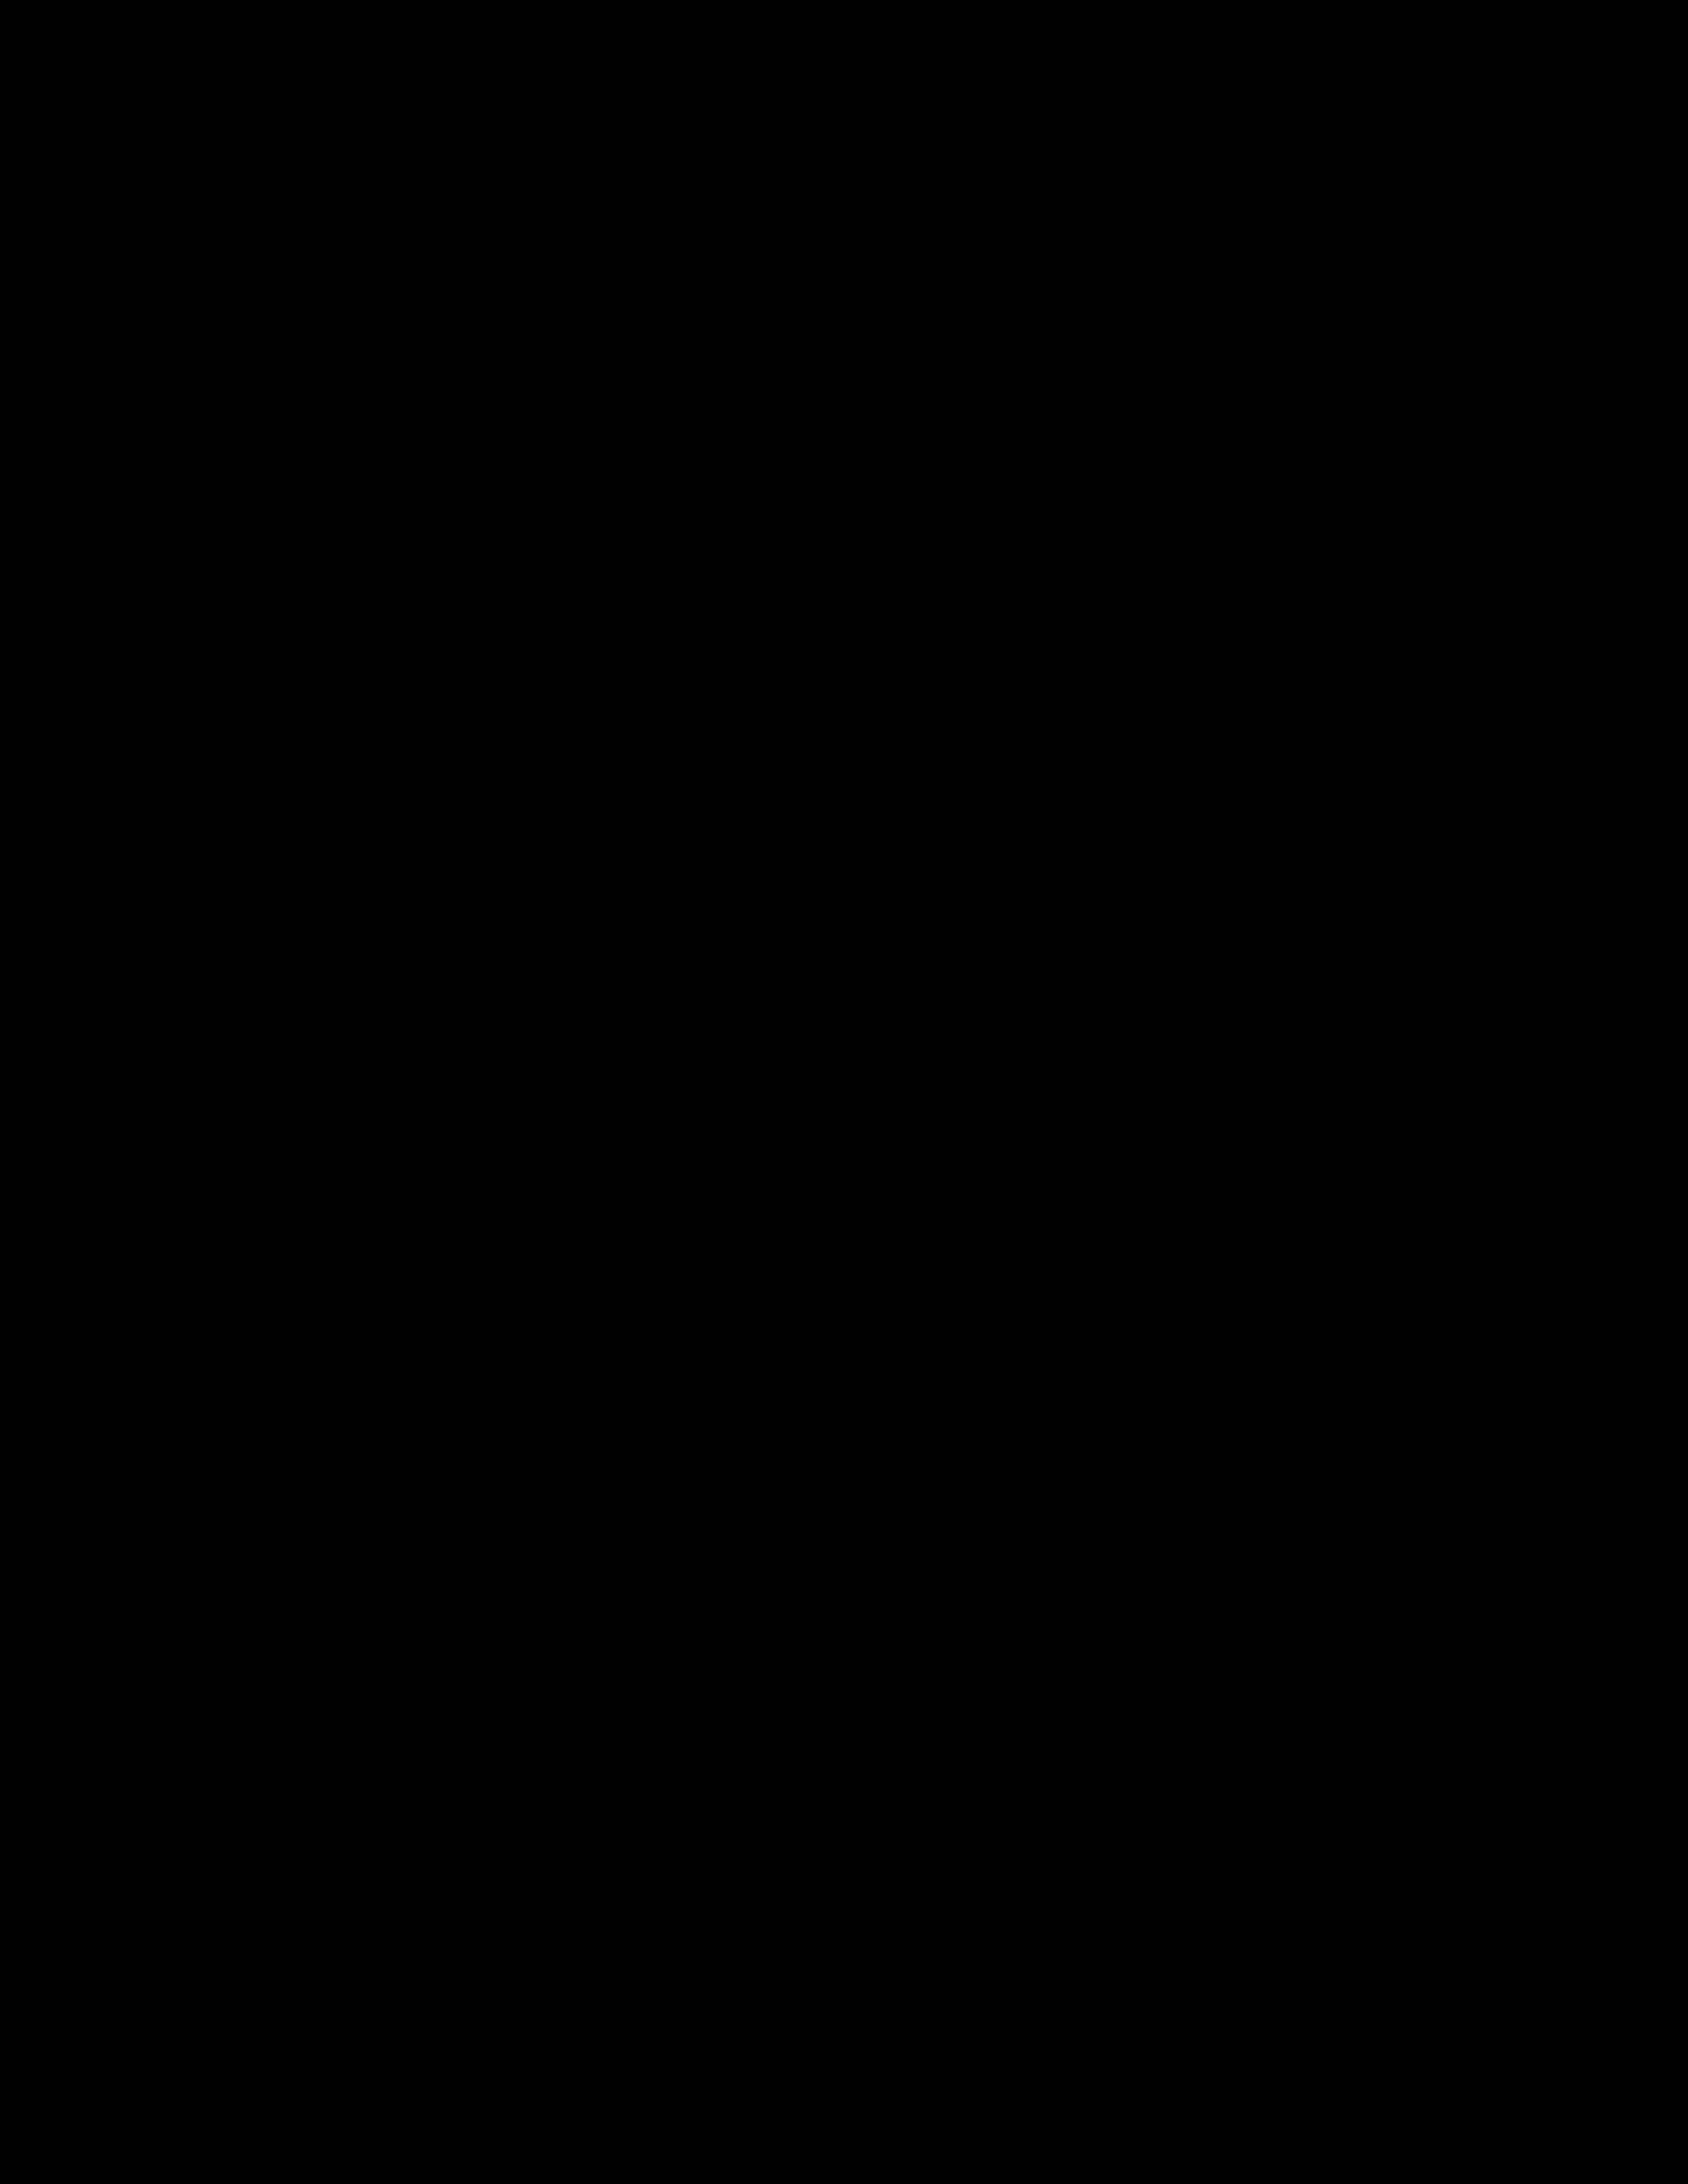 giant-apple-logo-bw.png